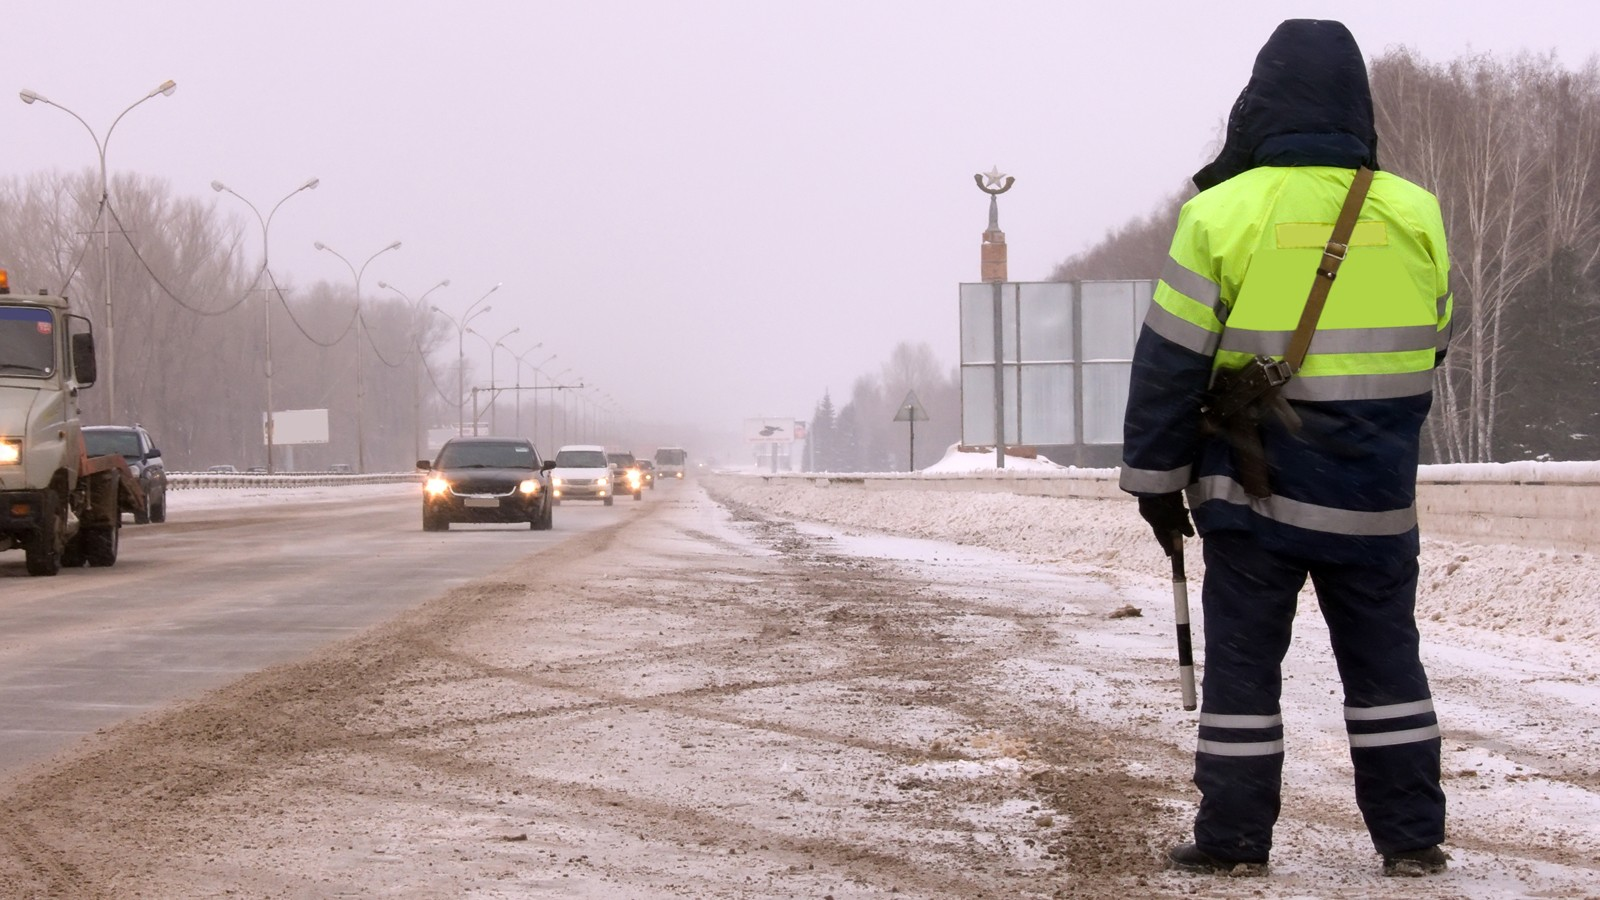 Policeman clothes uniform